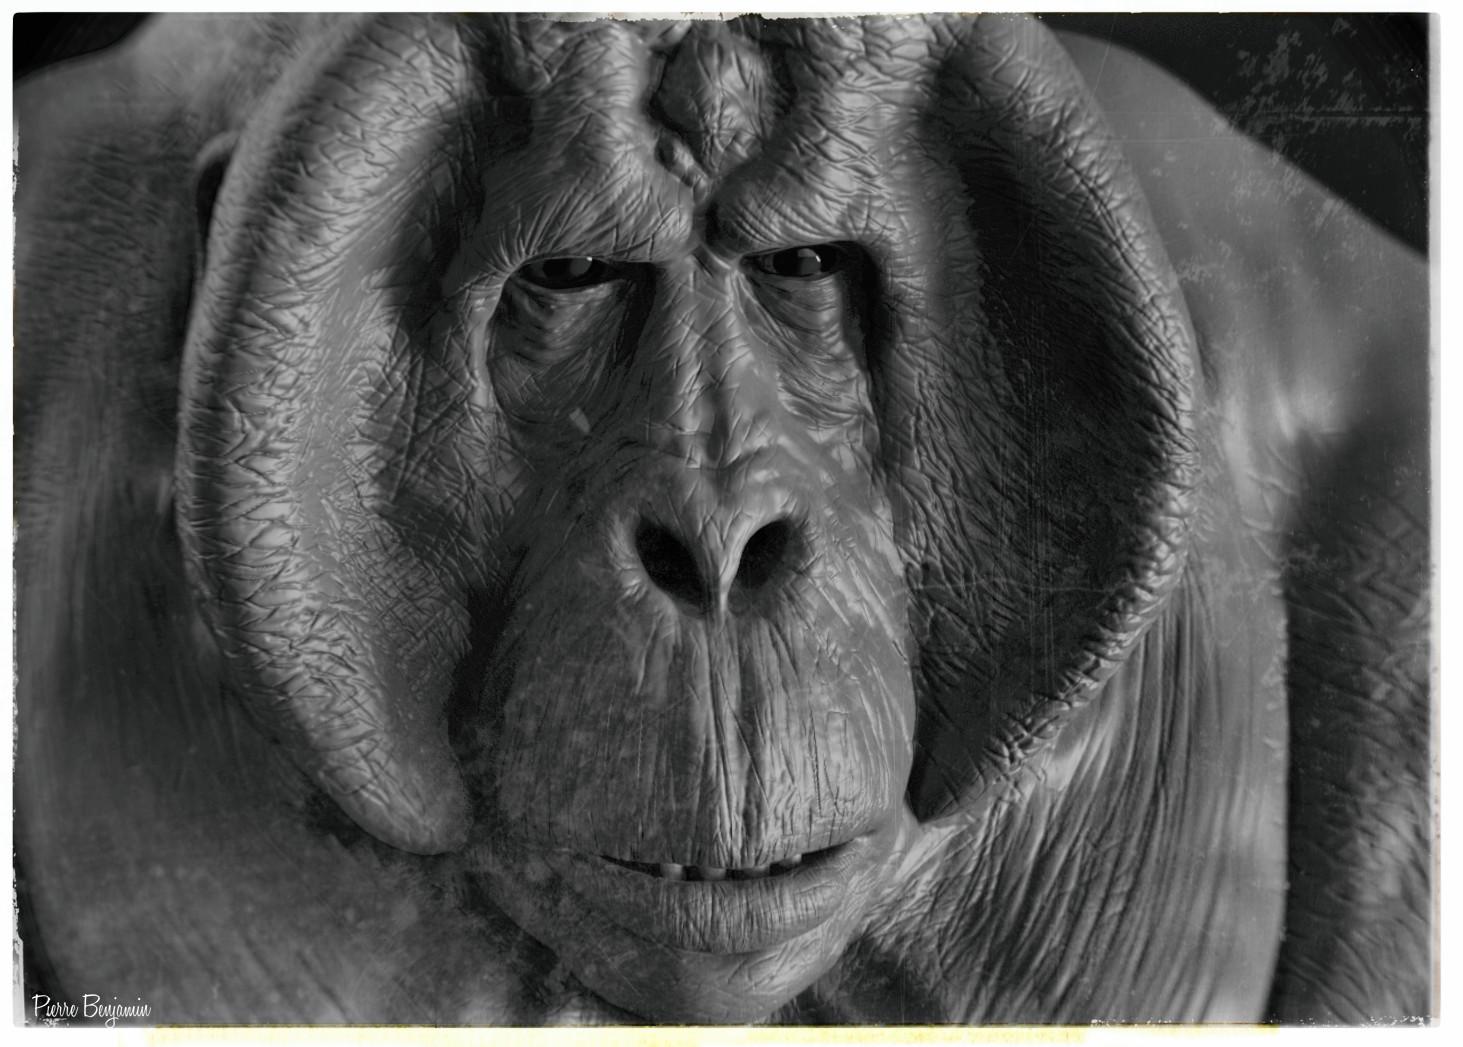 Pierre benjamin orangutan scene 001 244240sss